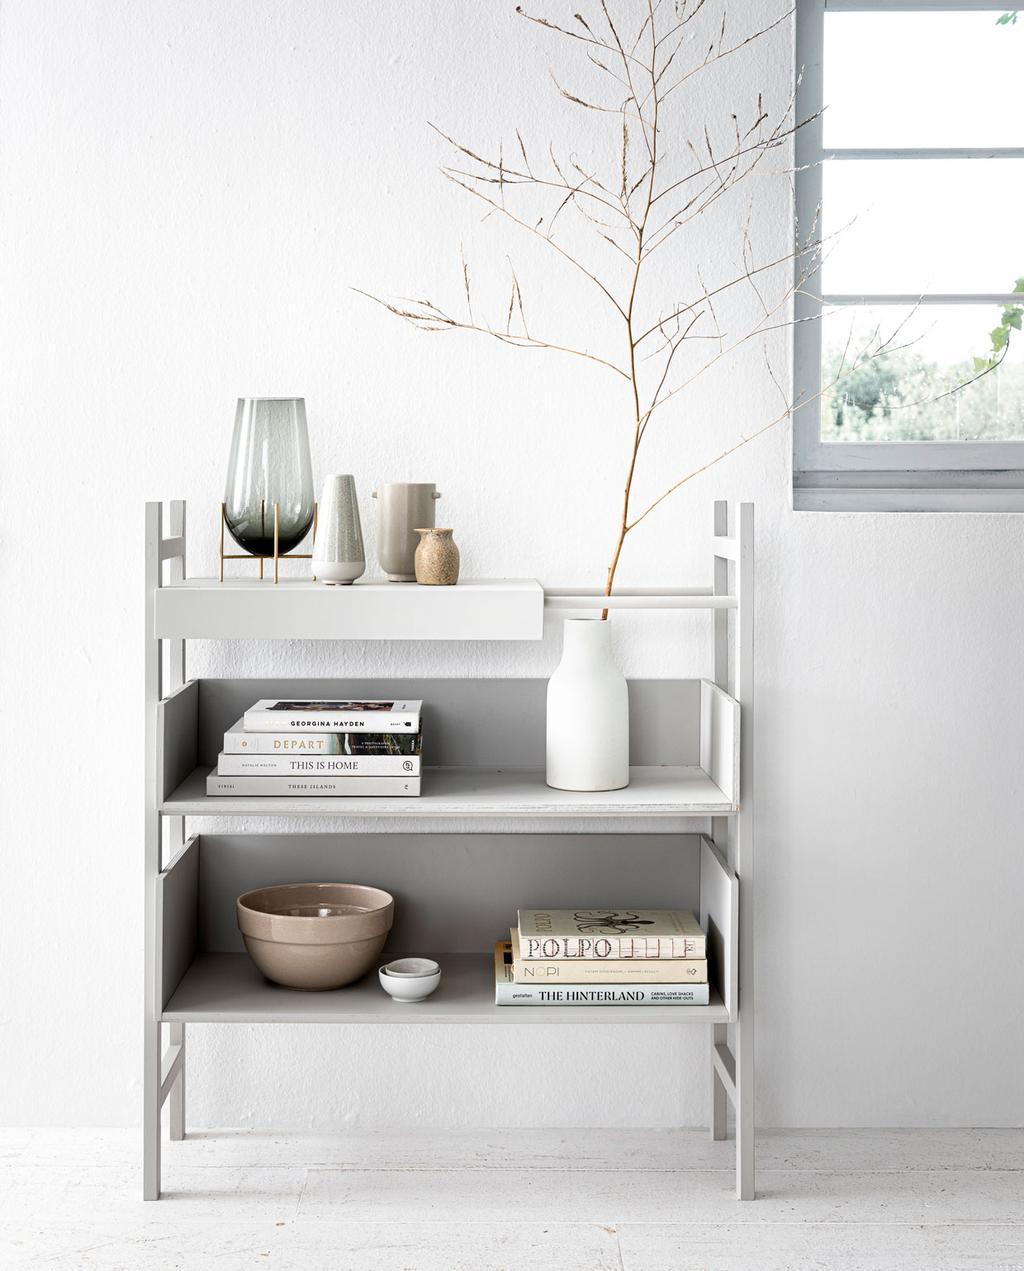 vtwonen 12-2019 | DIY flexibel kastje stap 5